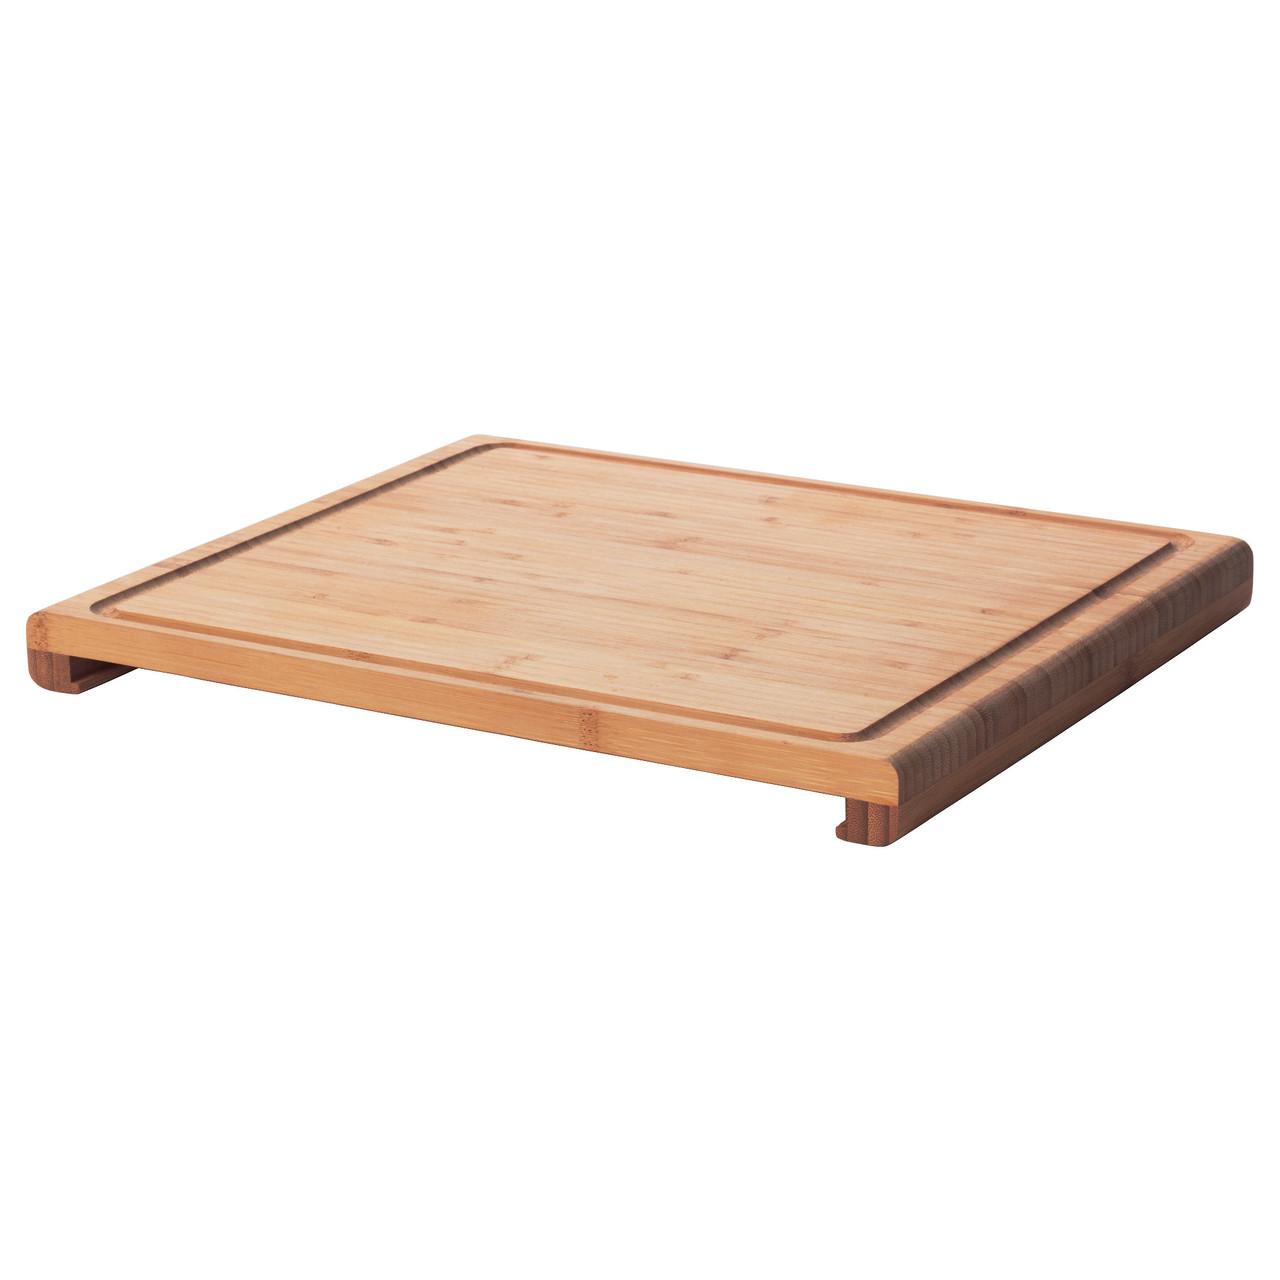 РИМФОРСА Доска разделочная, бамбук, 602.820.68